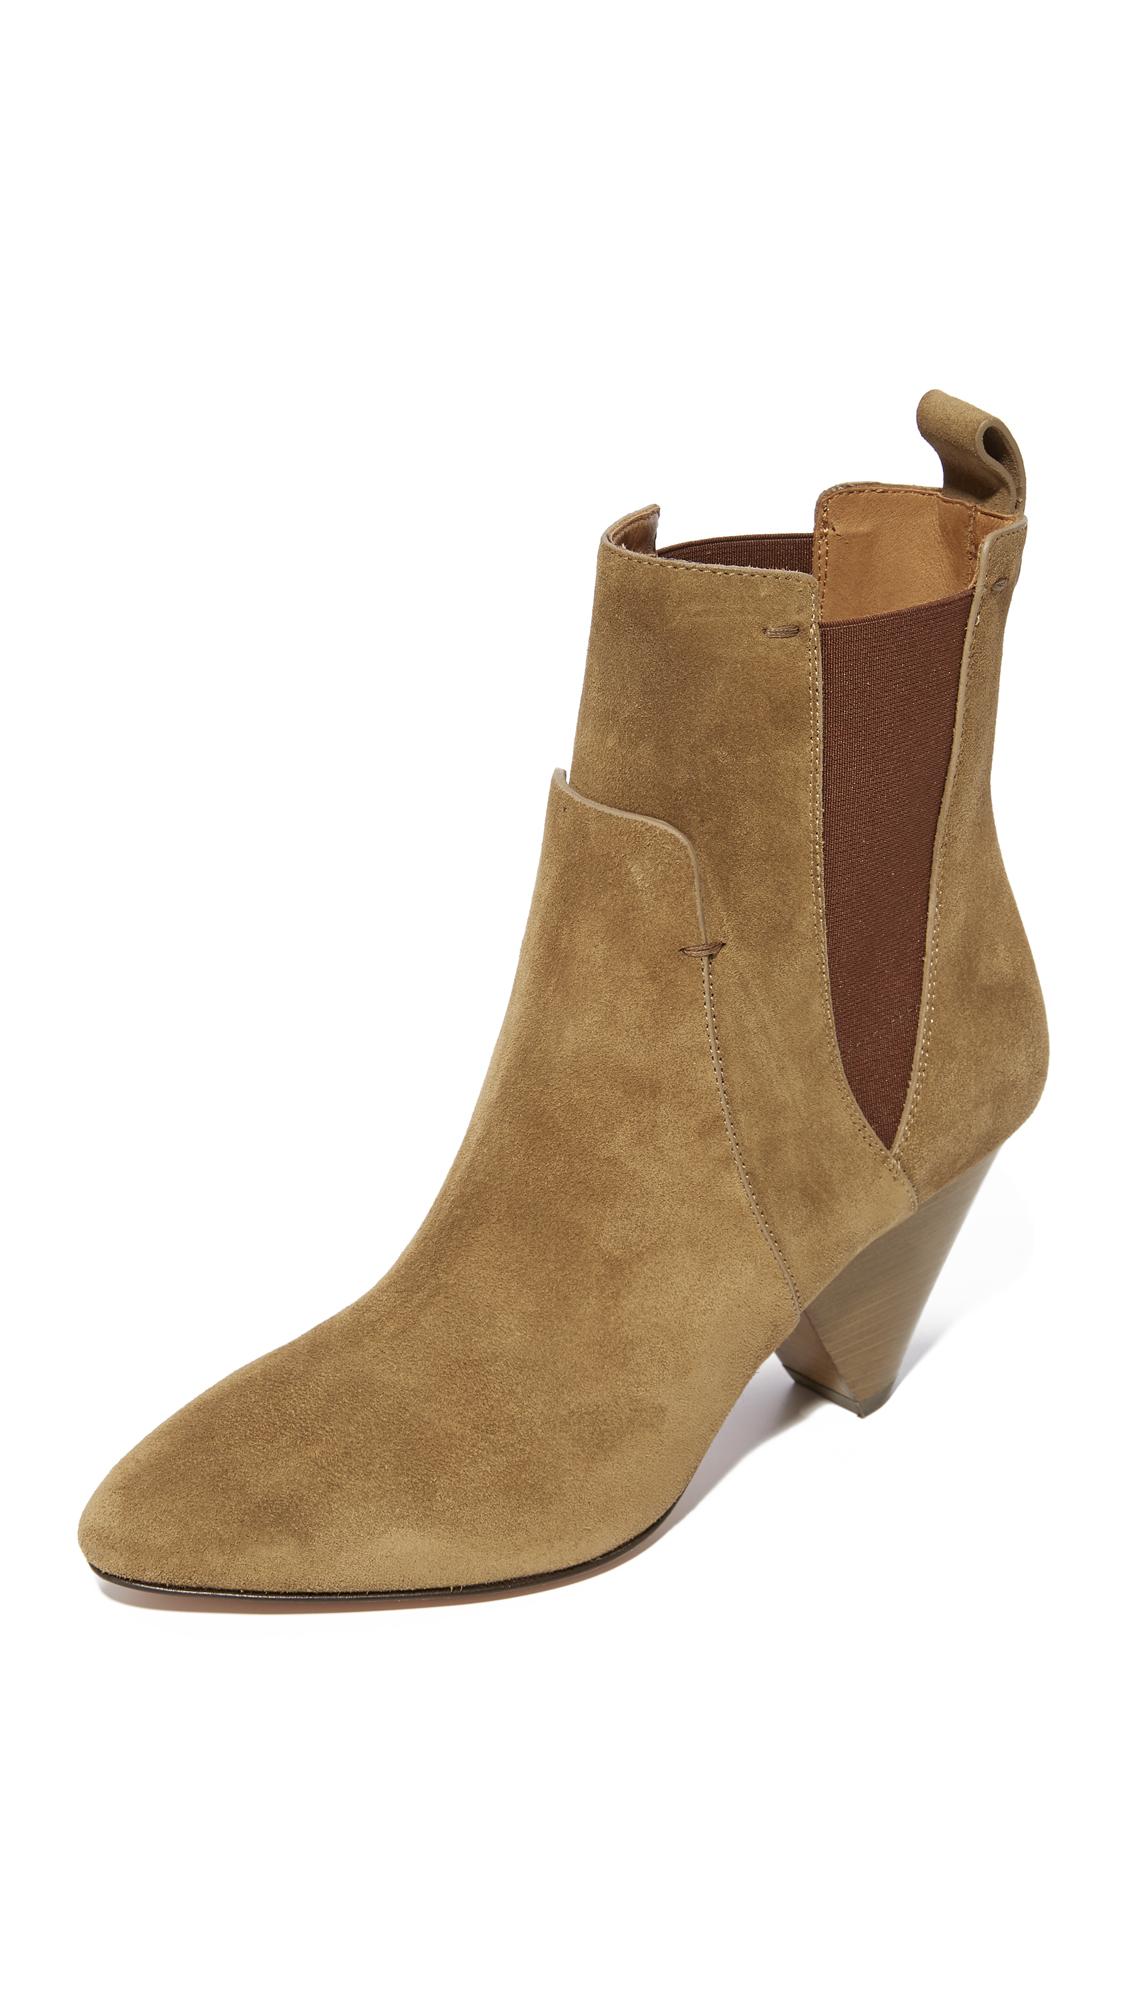 Veronica Beard Landon Heel Booties - Khaki